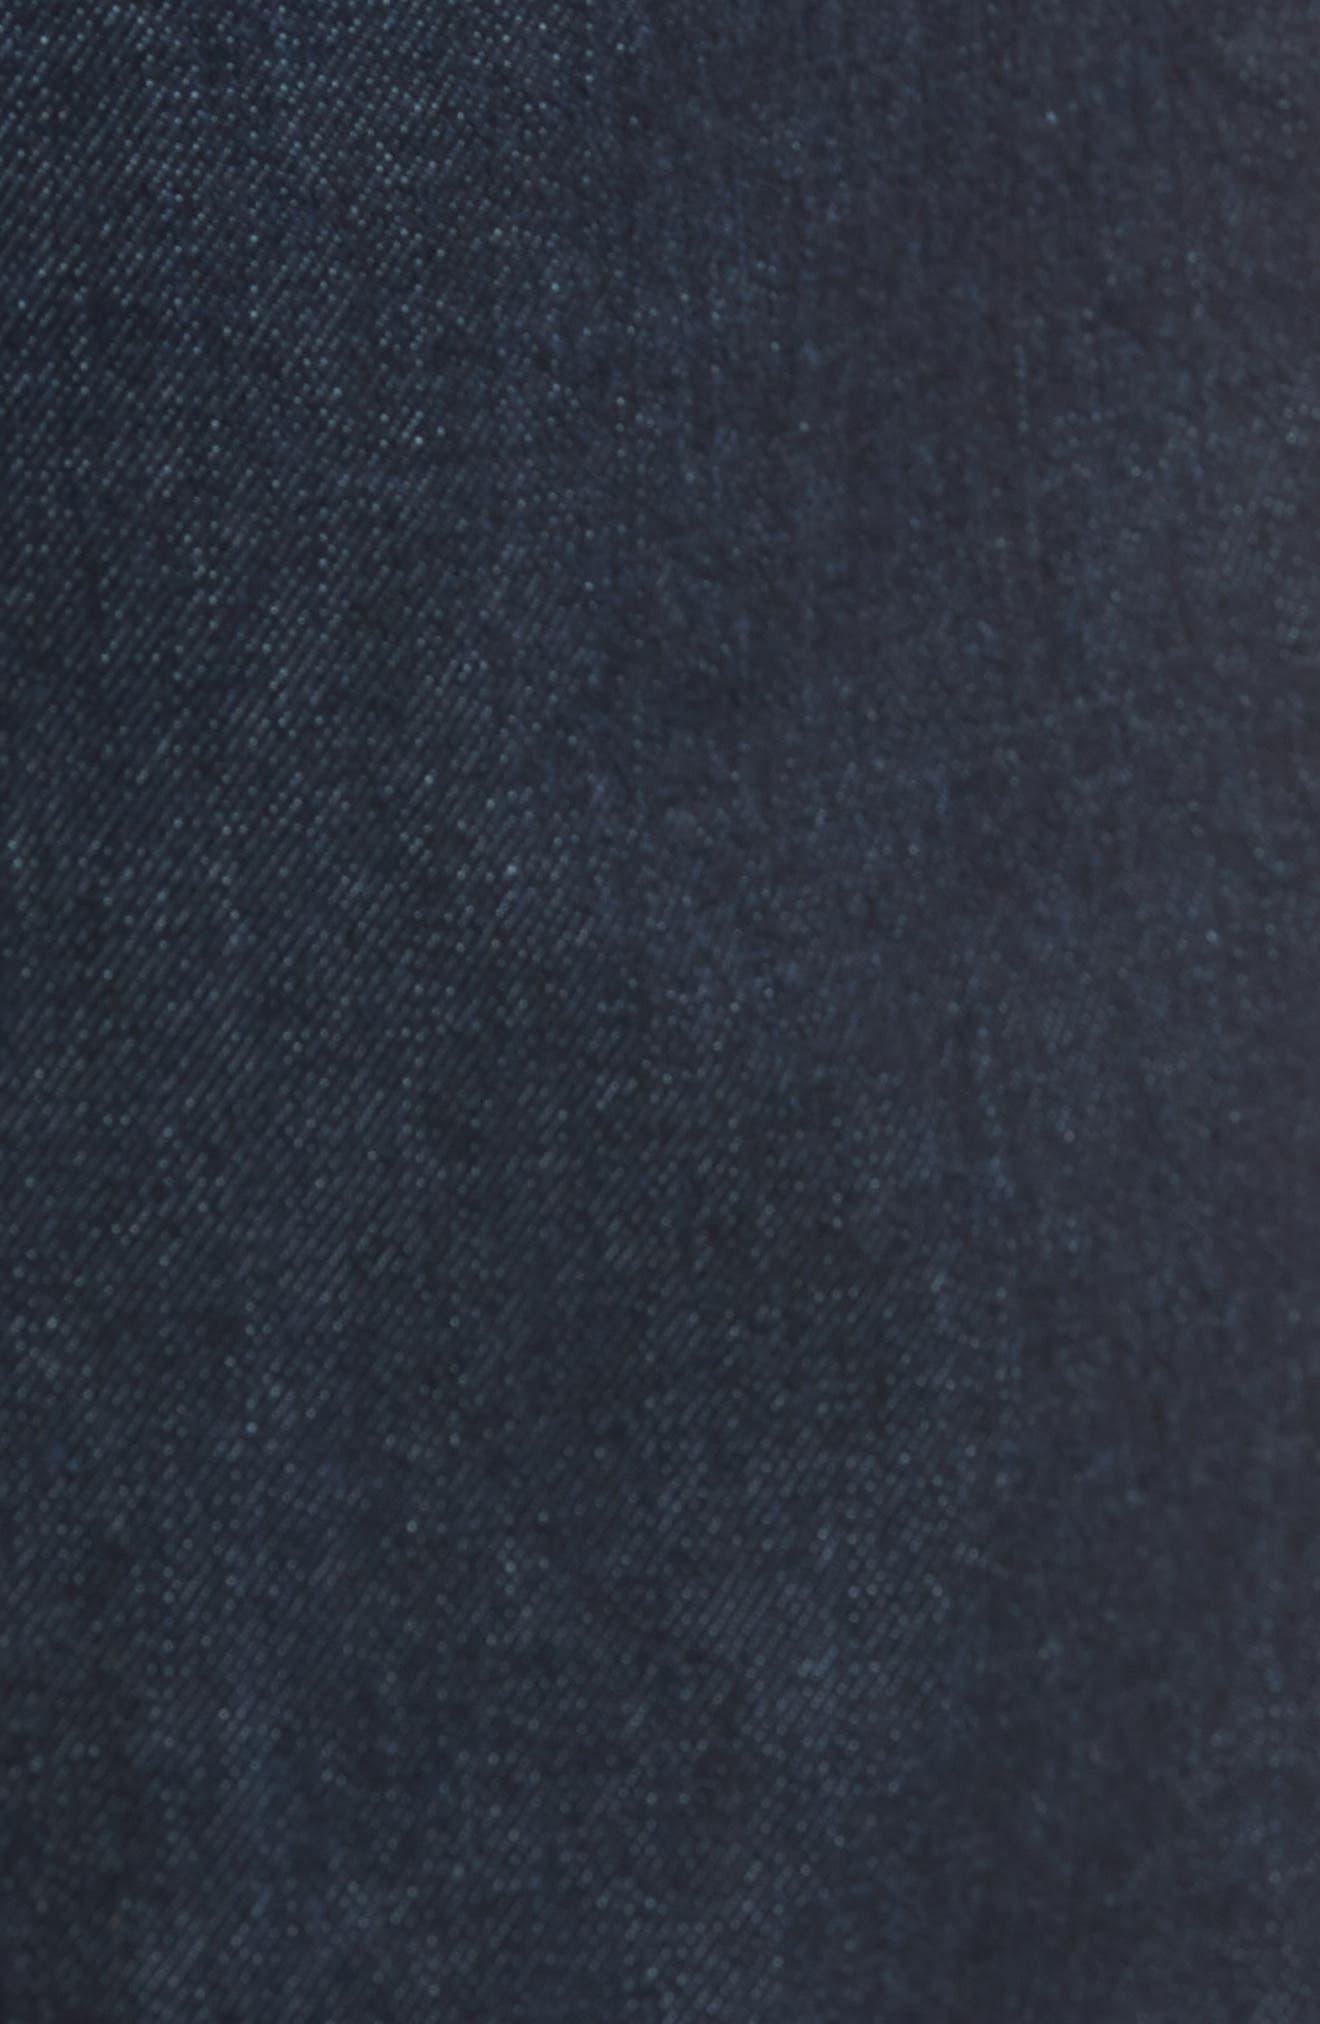 Jim Slim Fit Selvedge Jeans,                             Alternate thumbnail 5, color,                             Stretch Rinse